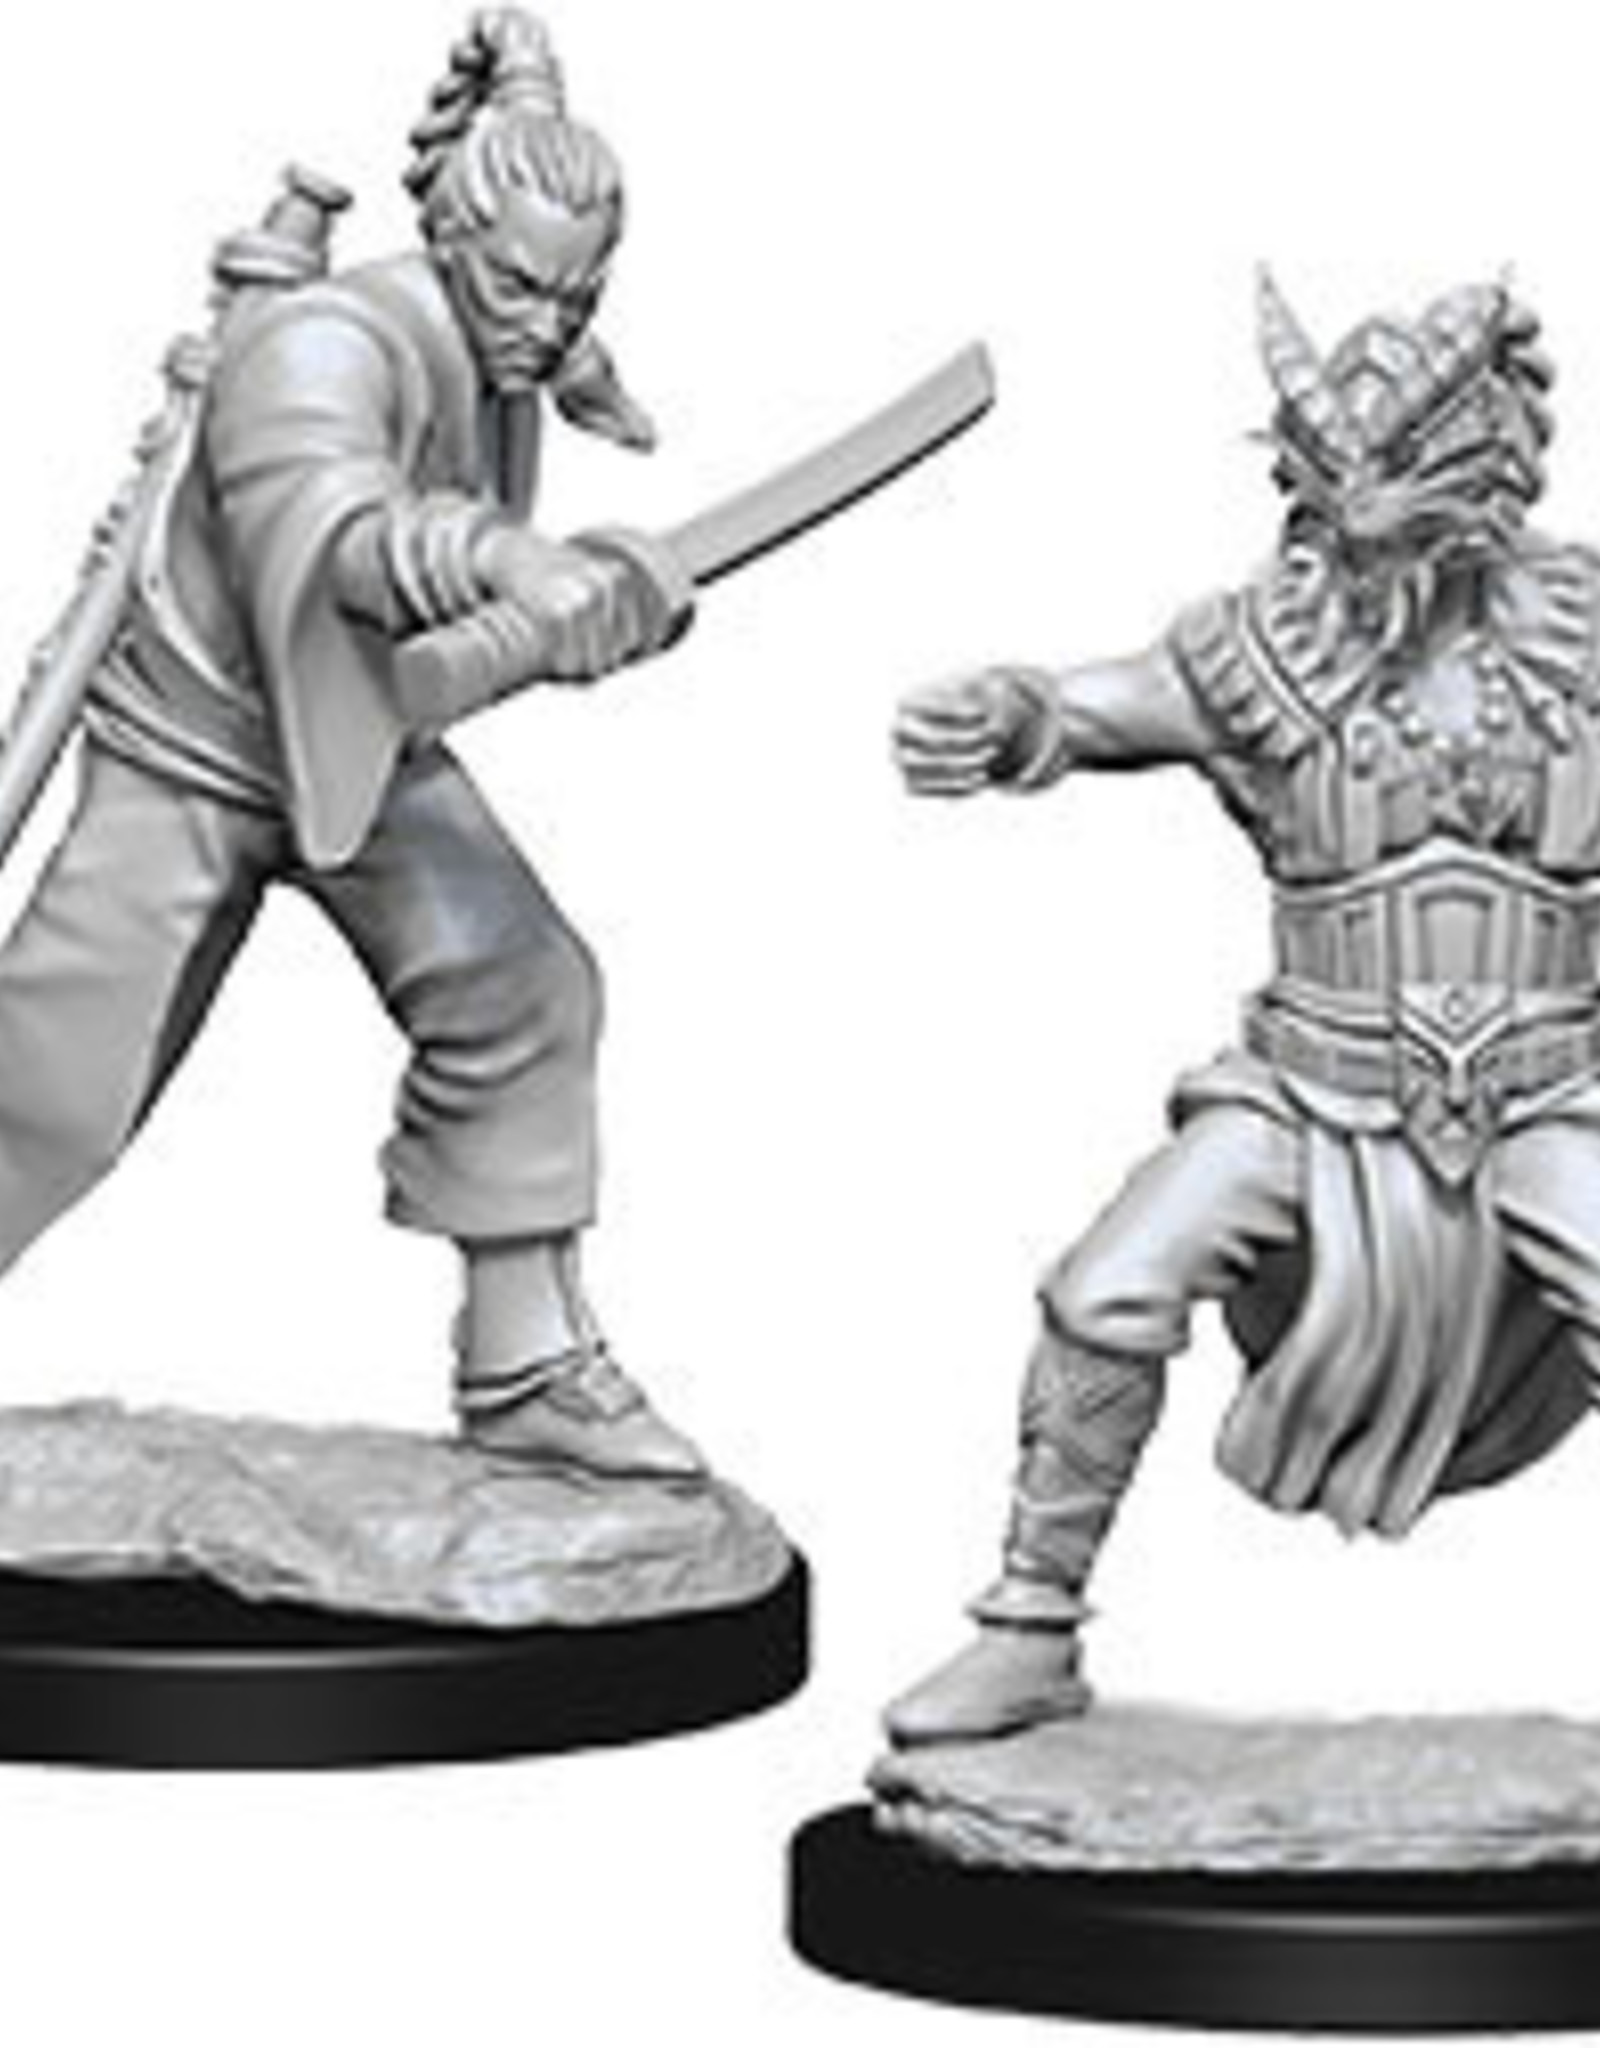 WizKids Dungeons & Dragons Nolzur's Marvelous Miniatures: Male Human Monk